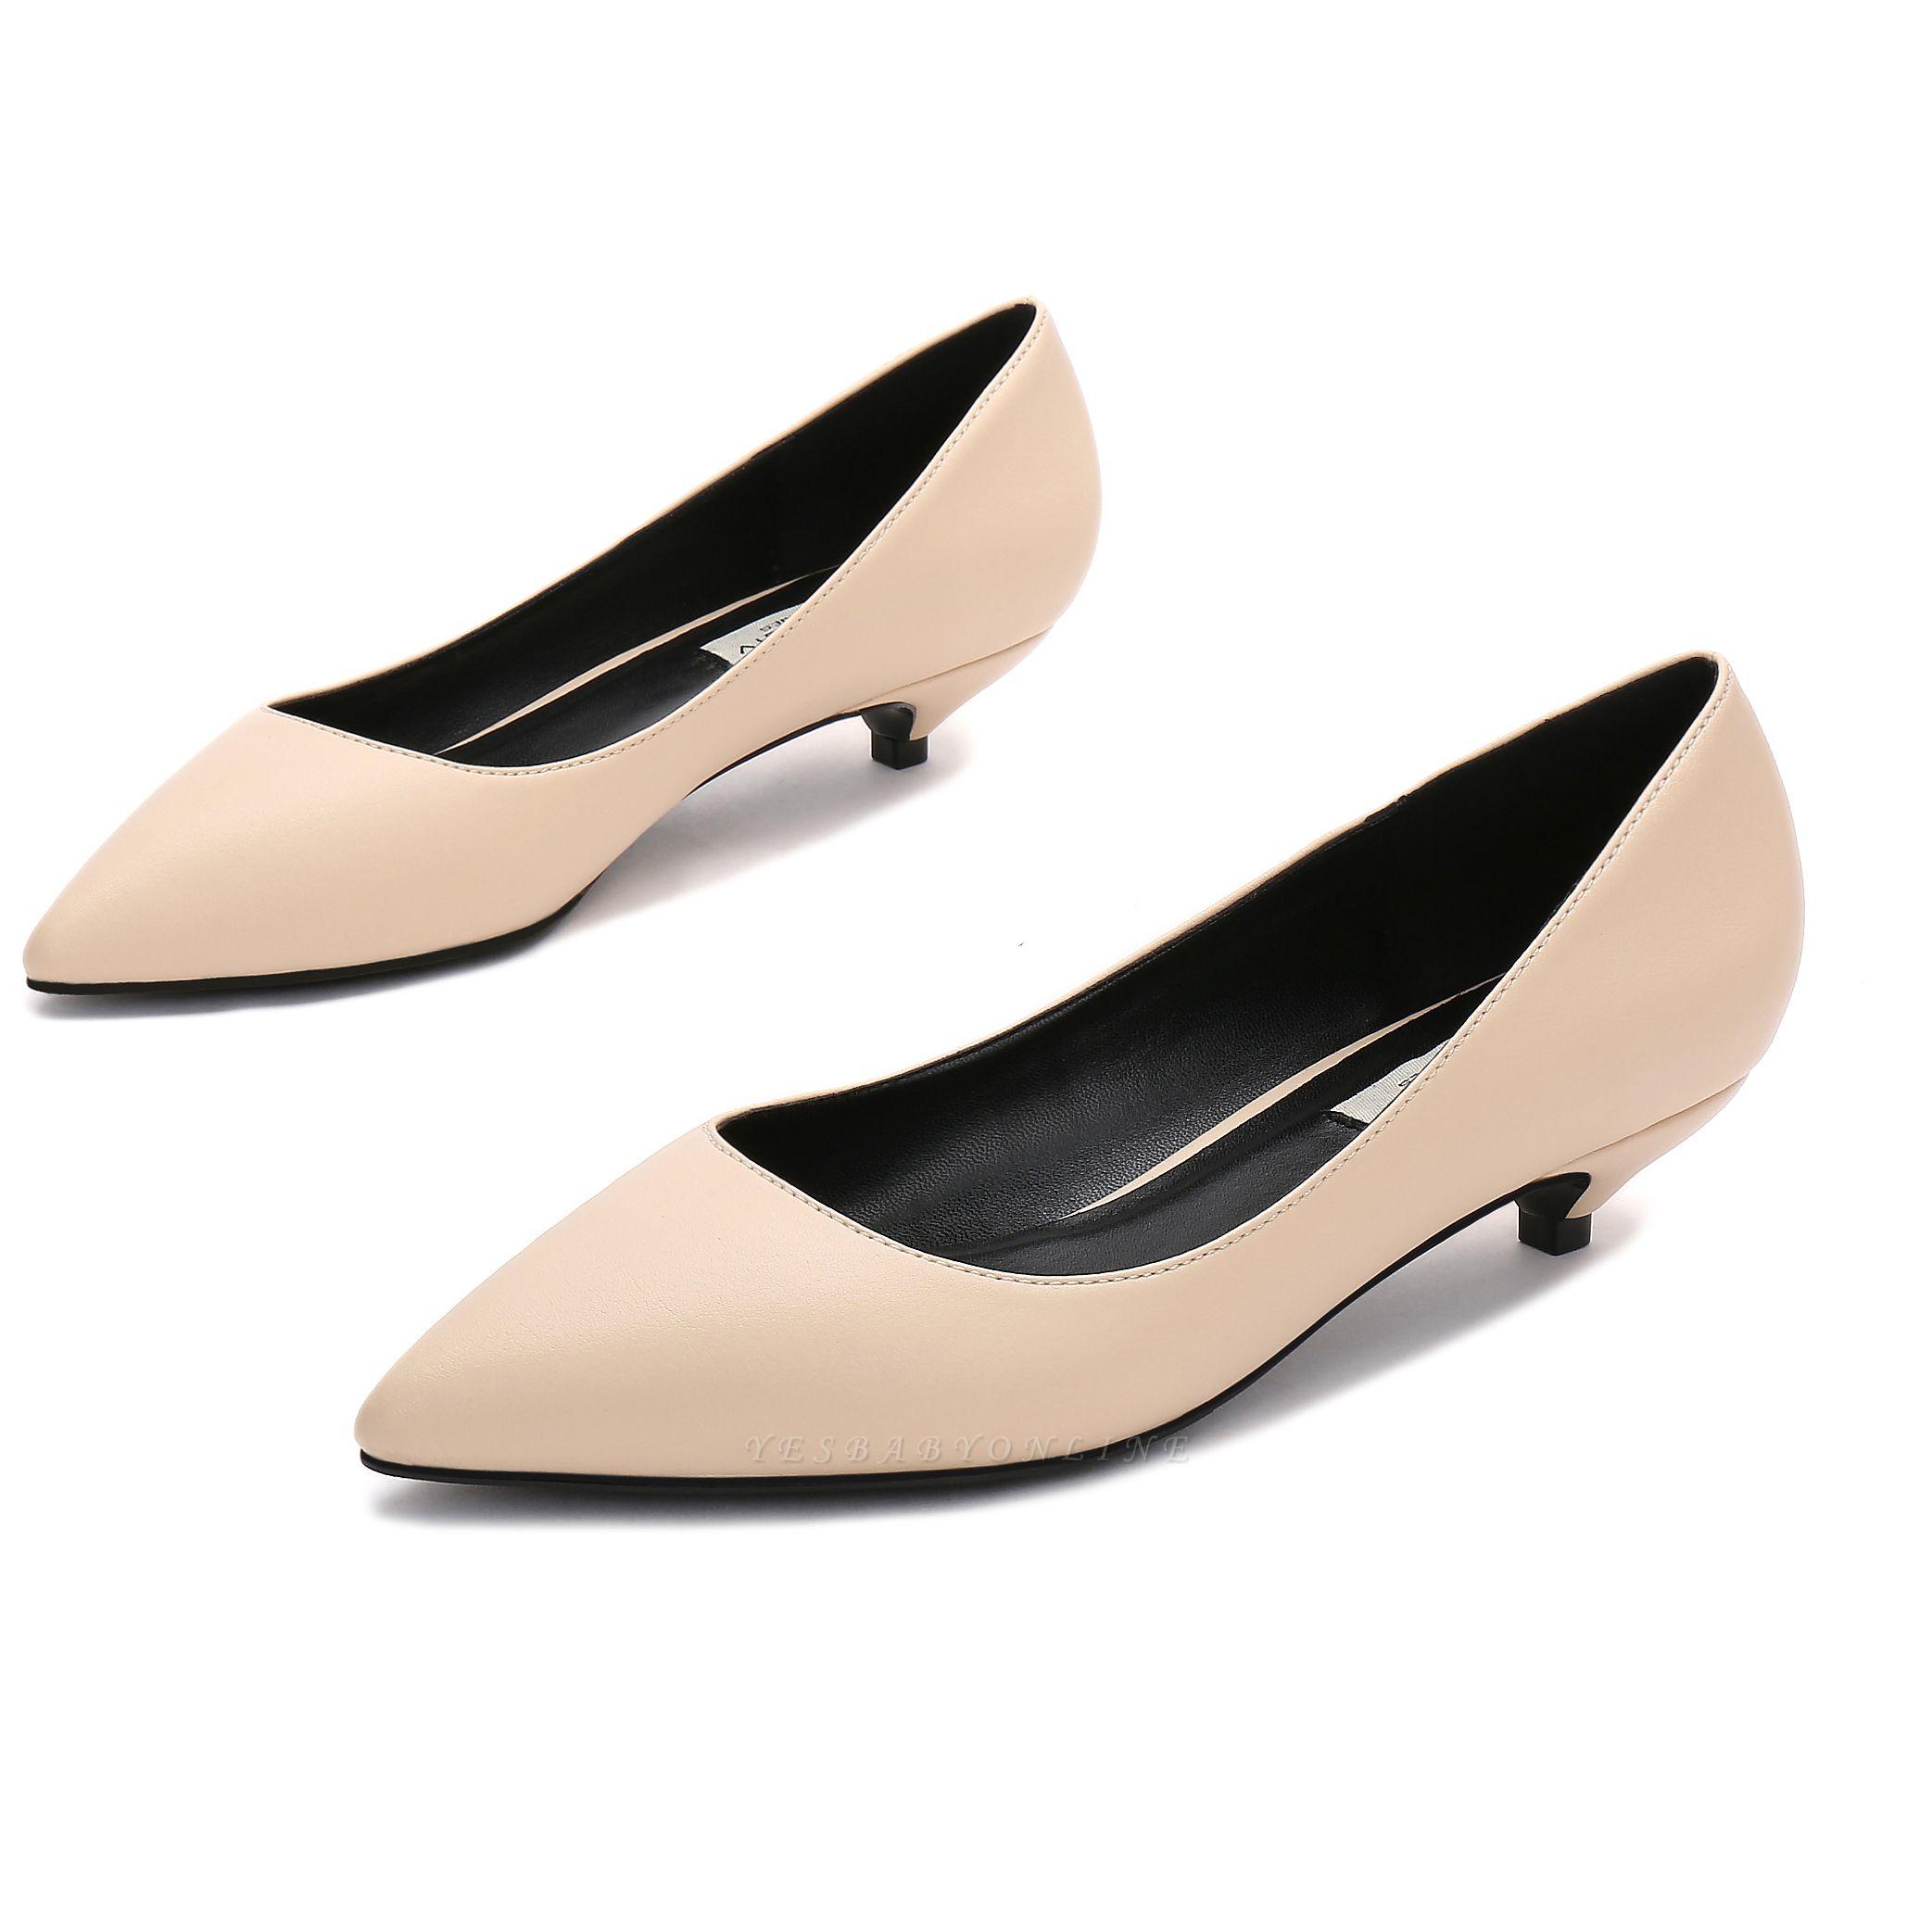 Woman Pointed Toe Kitten Heel Wedding Shoes